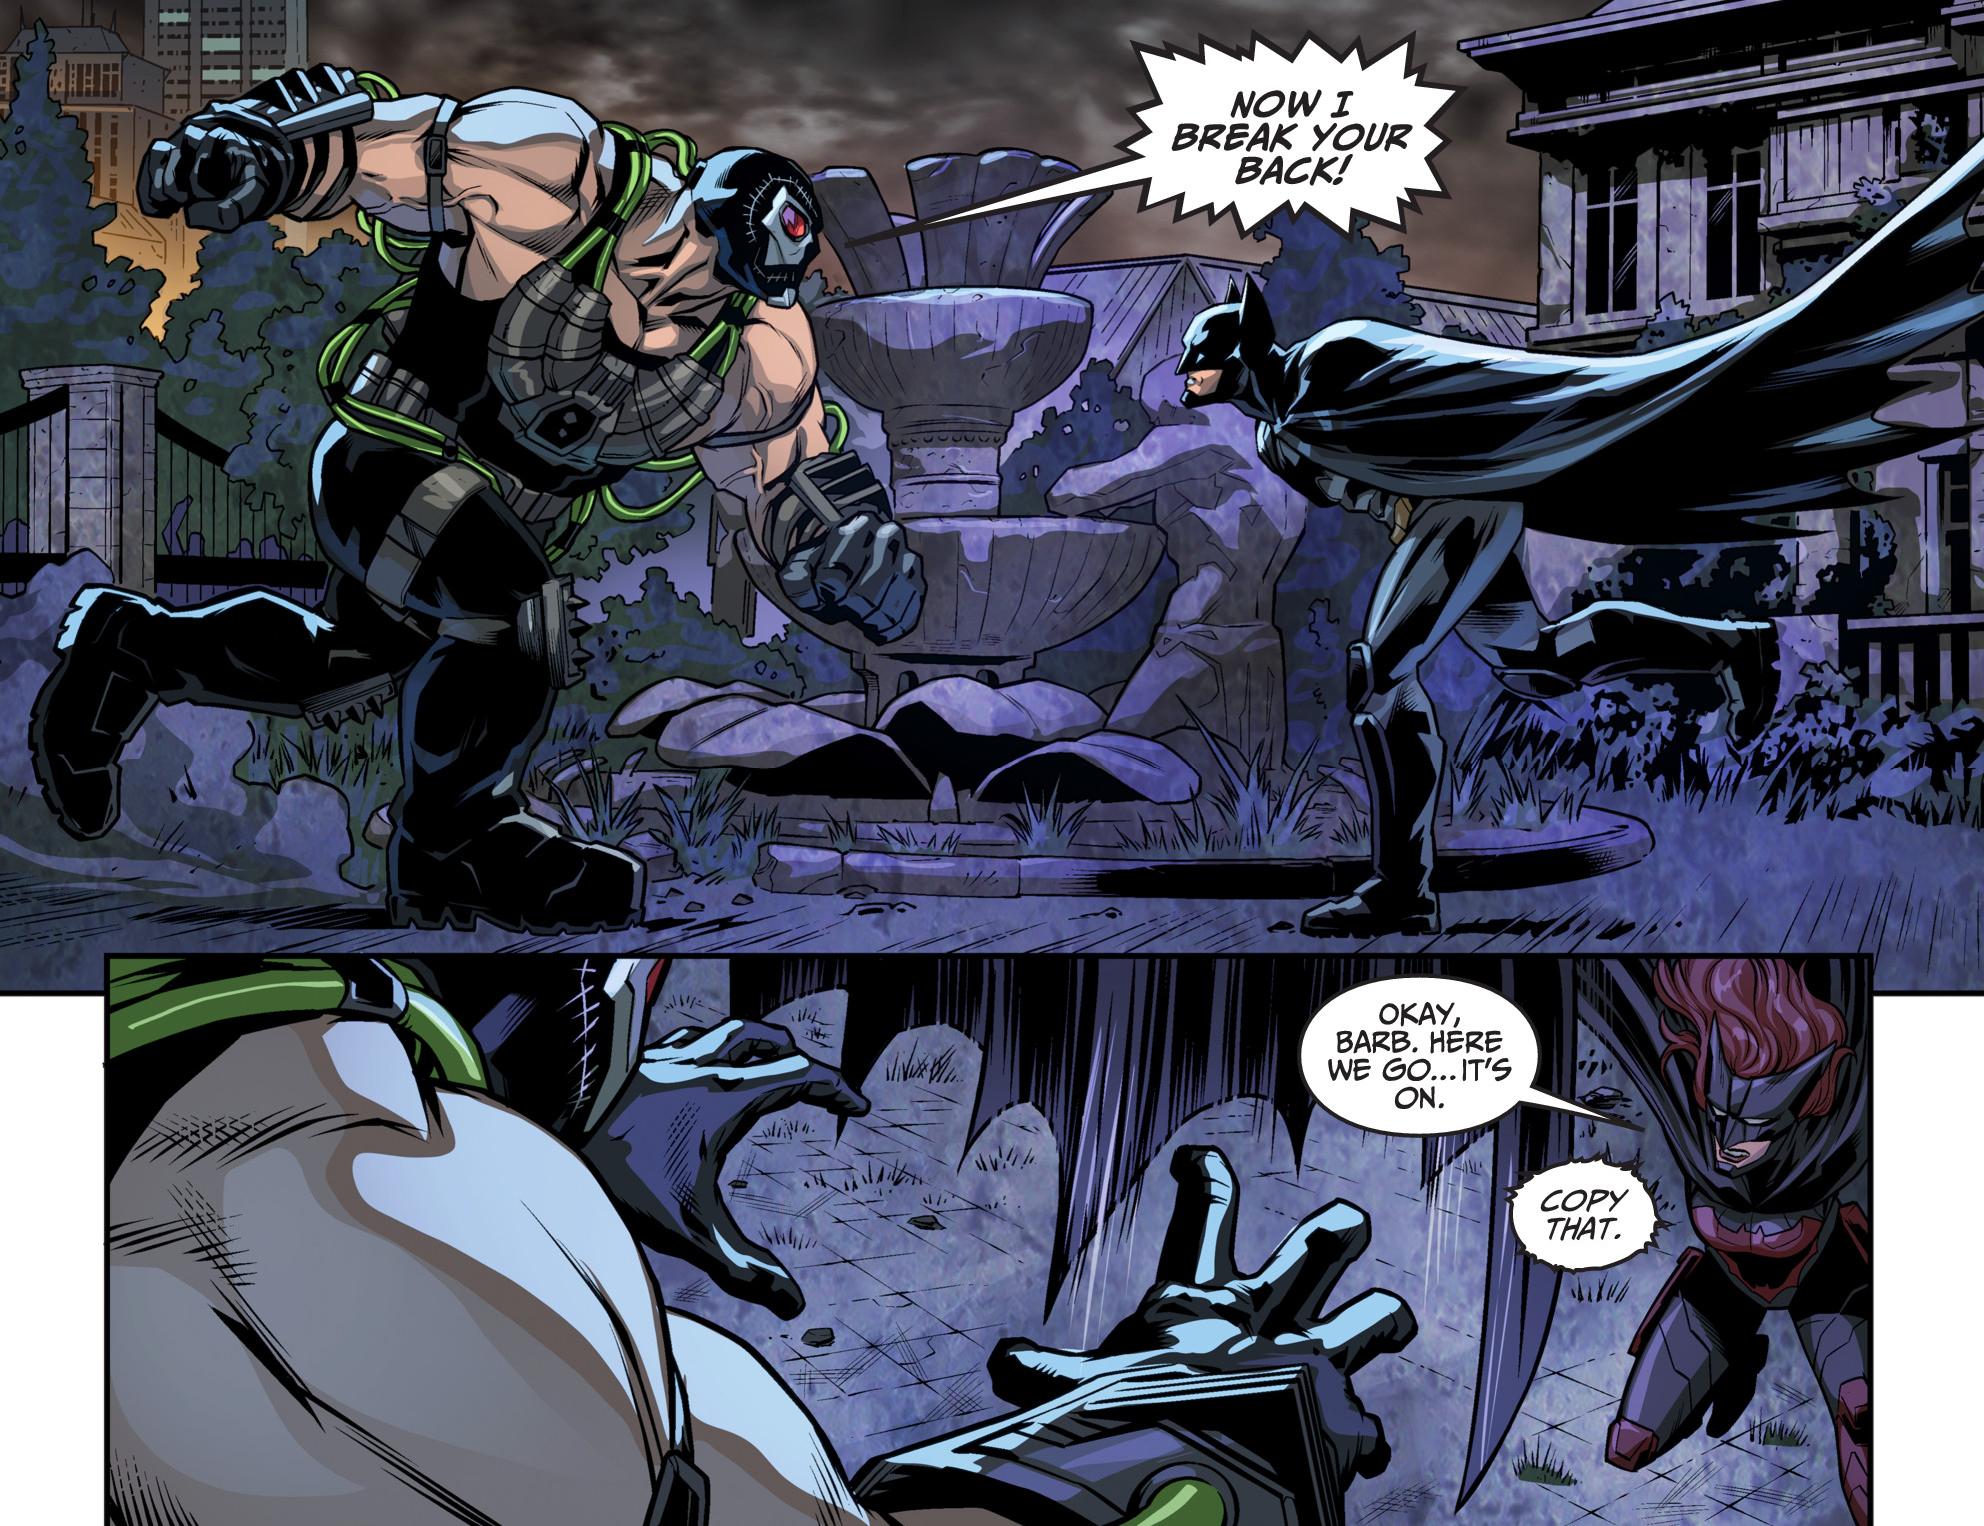 bane vs batman decoy (injustice gods among us)